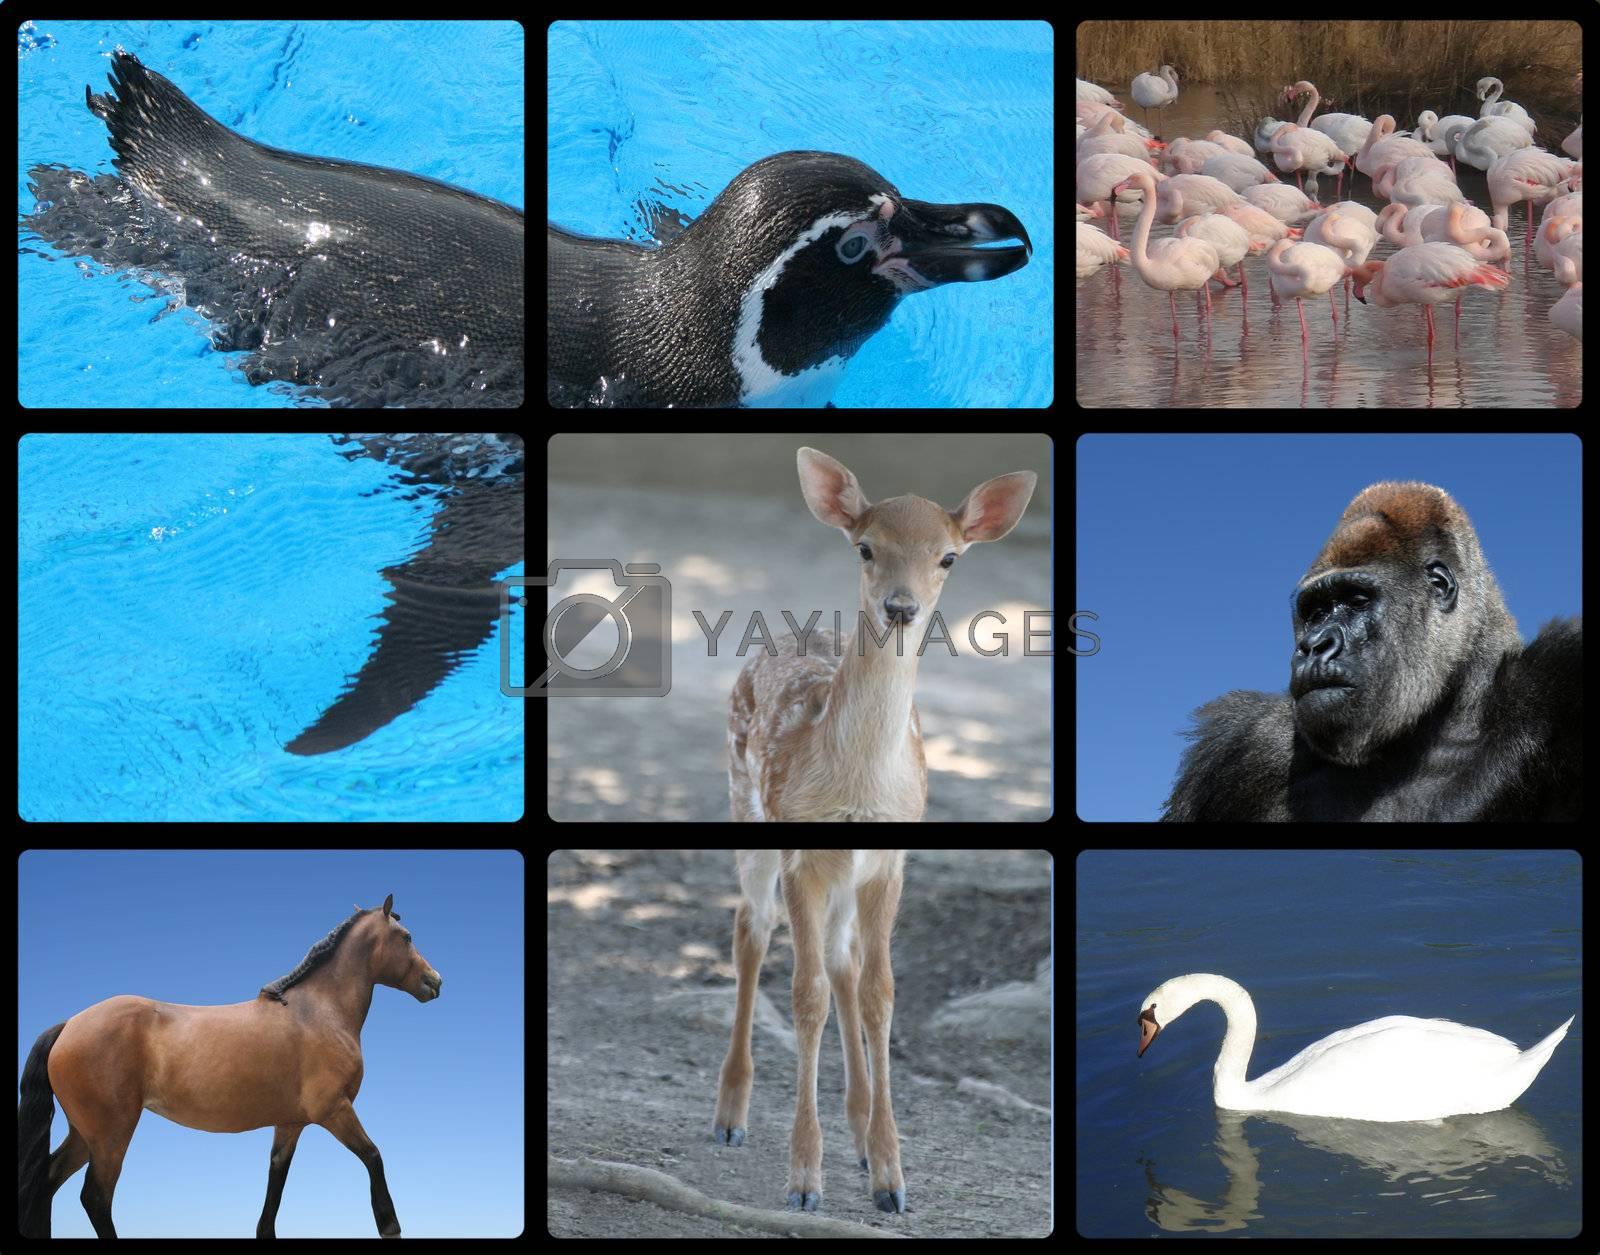 Animals - horse gorilla deer penguin flamingo swan